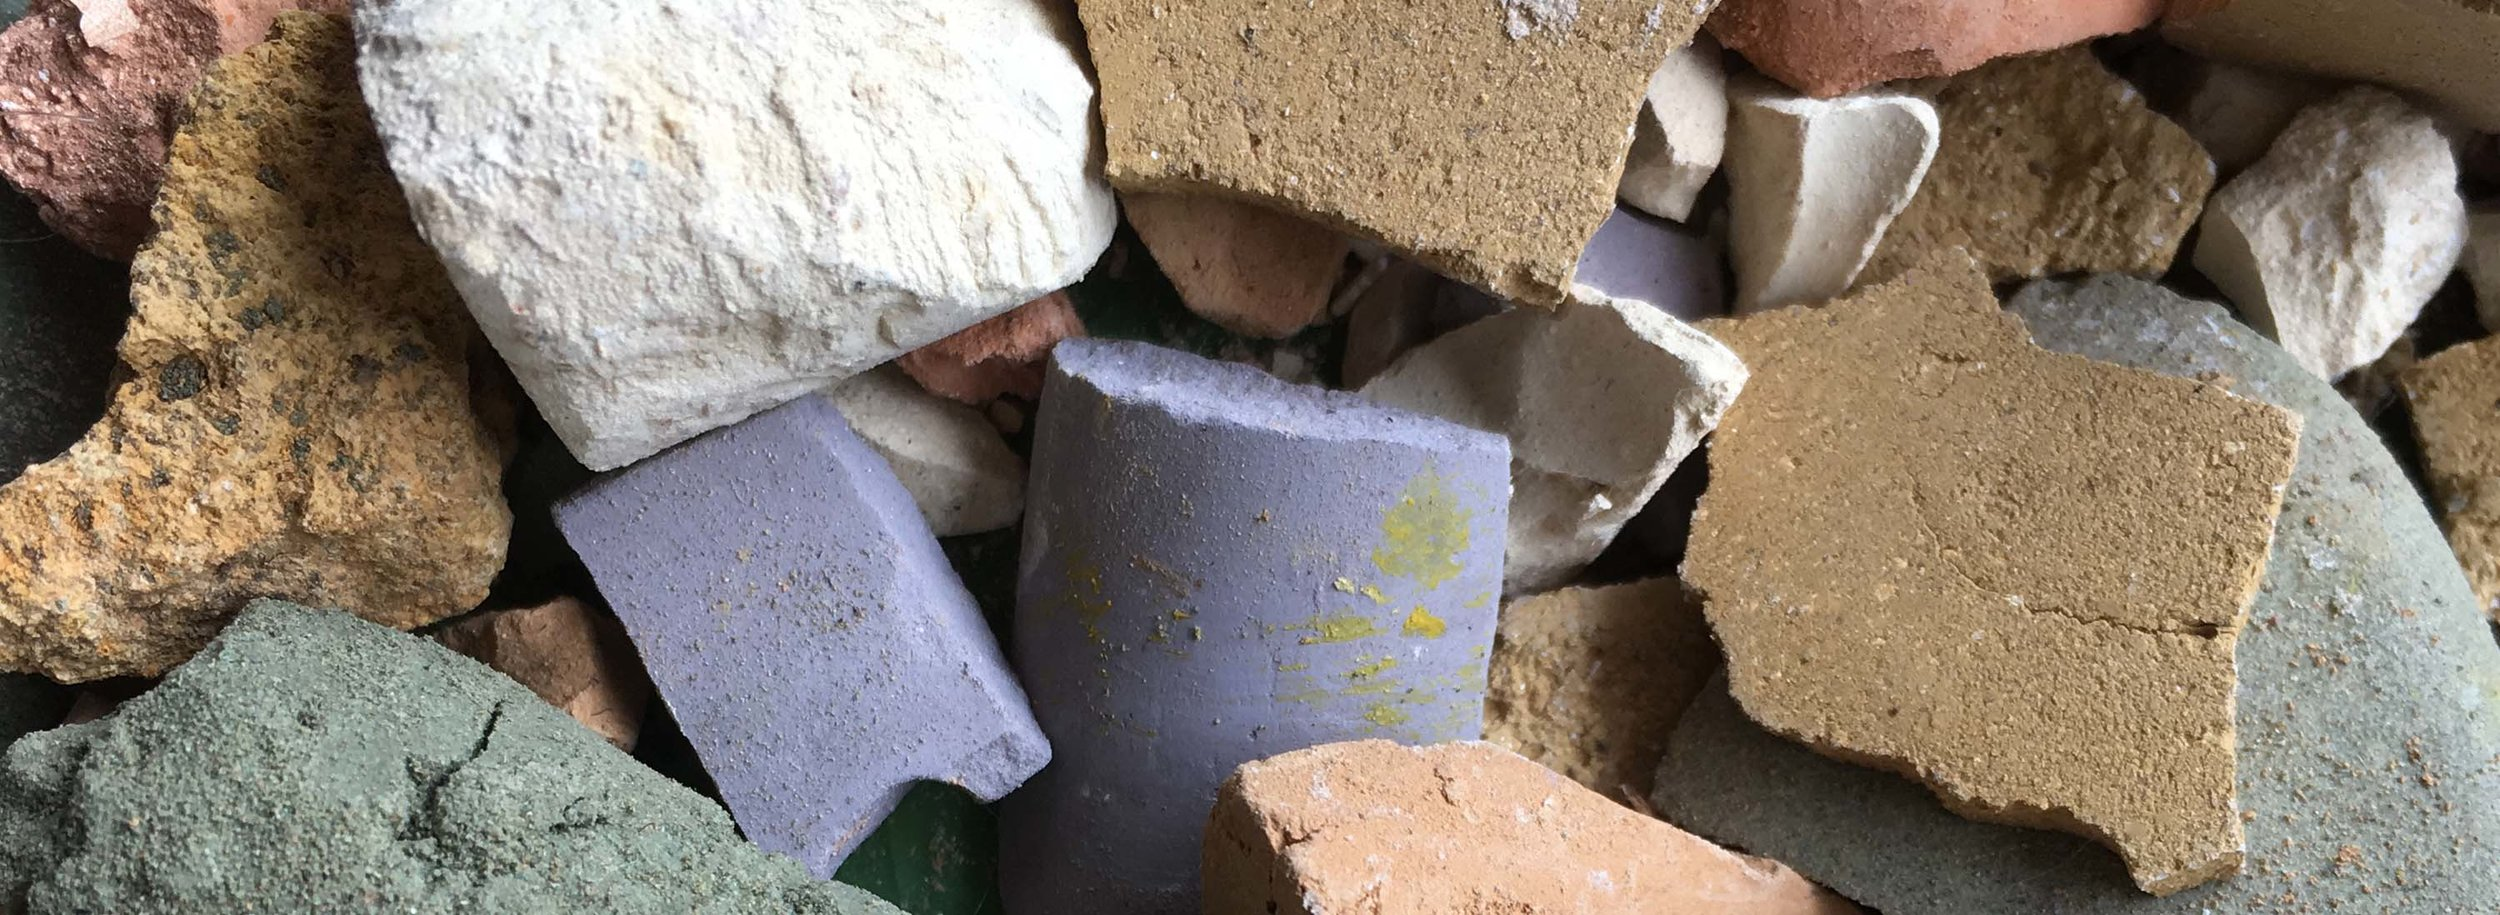 Dried iron ore pigments gathered near the Umpqua River in Oregon.